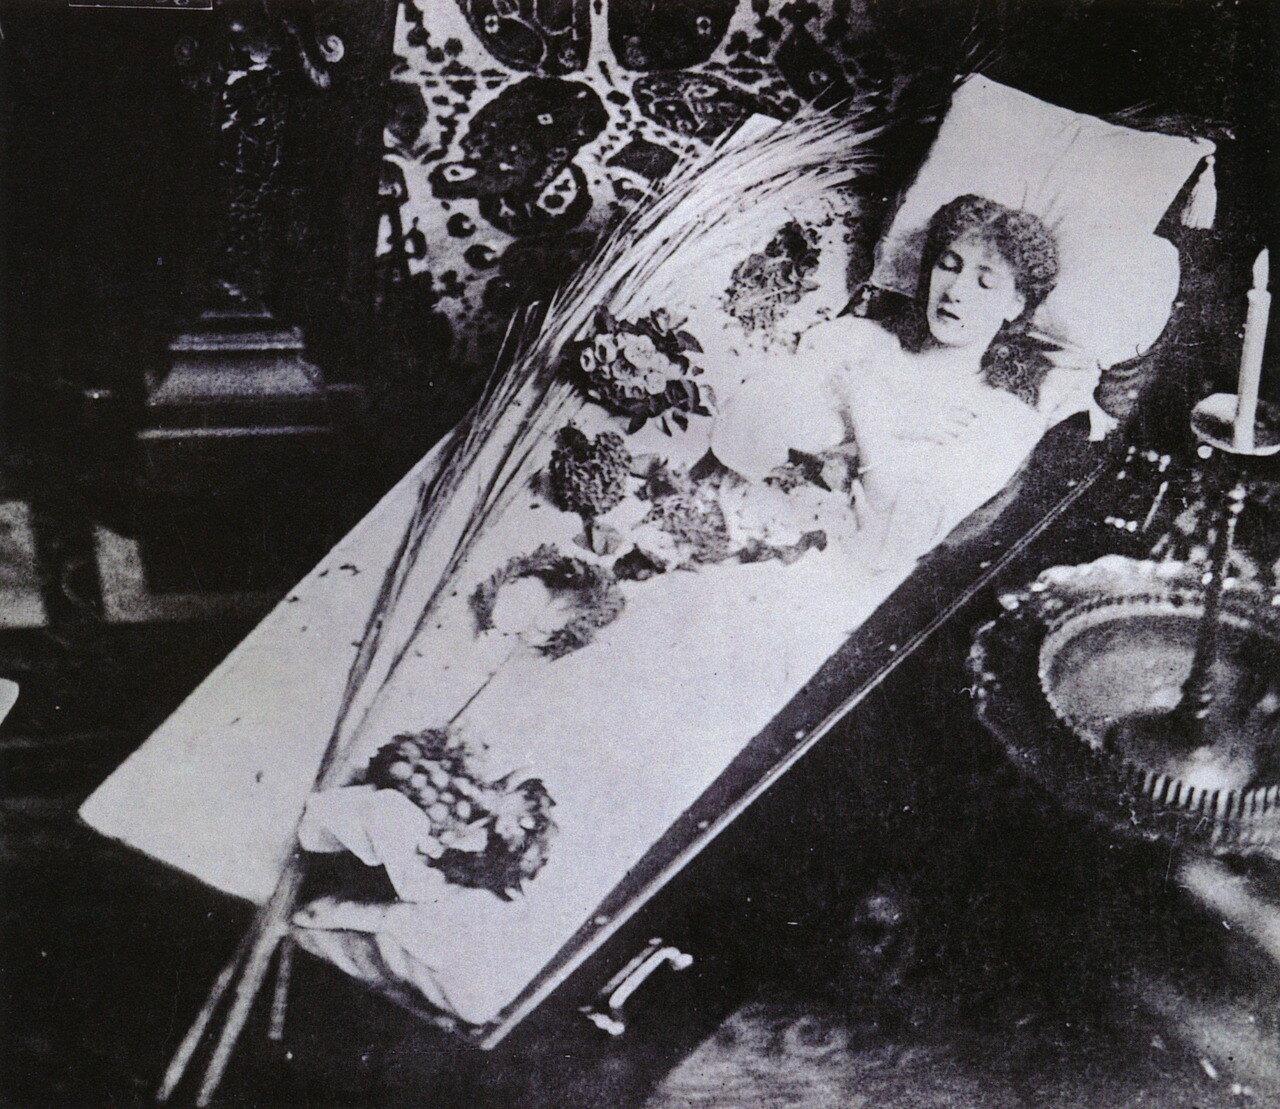 Похороны Айседоры Дункан